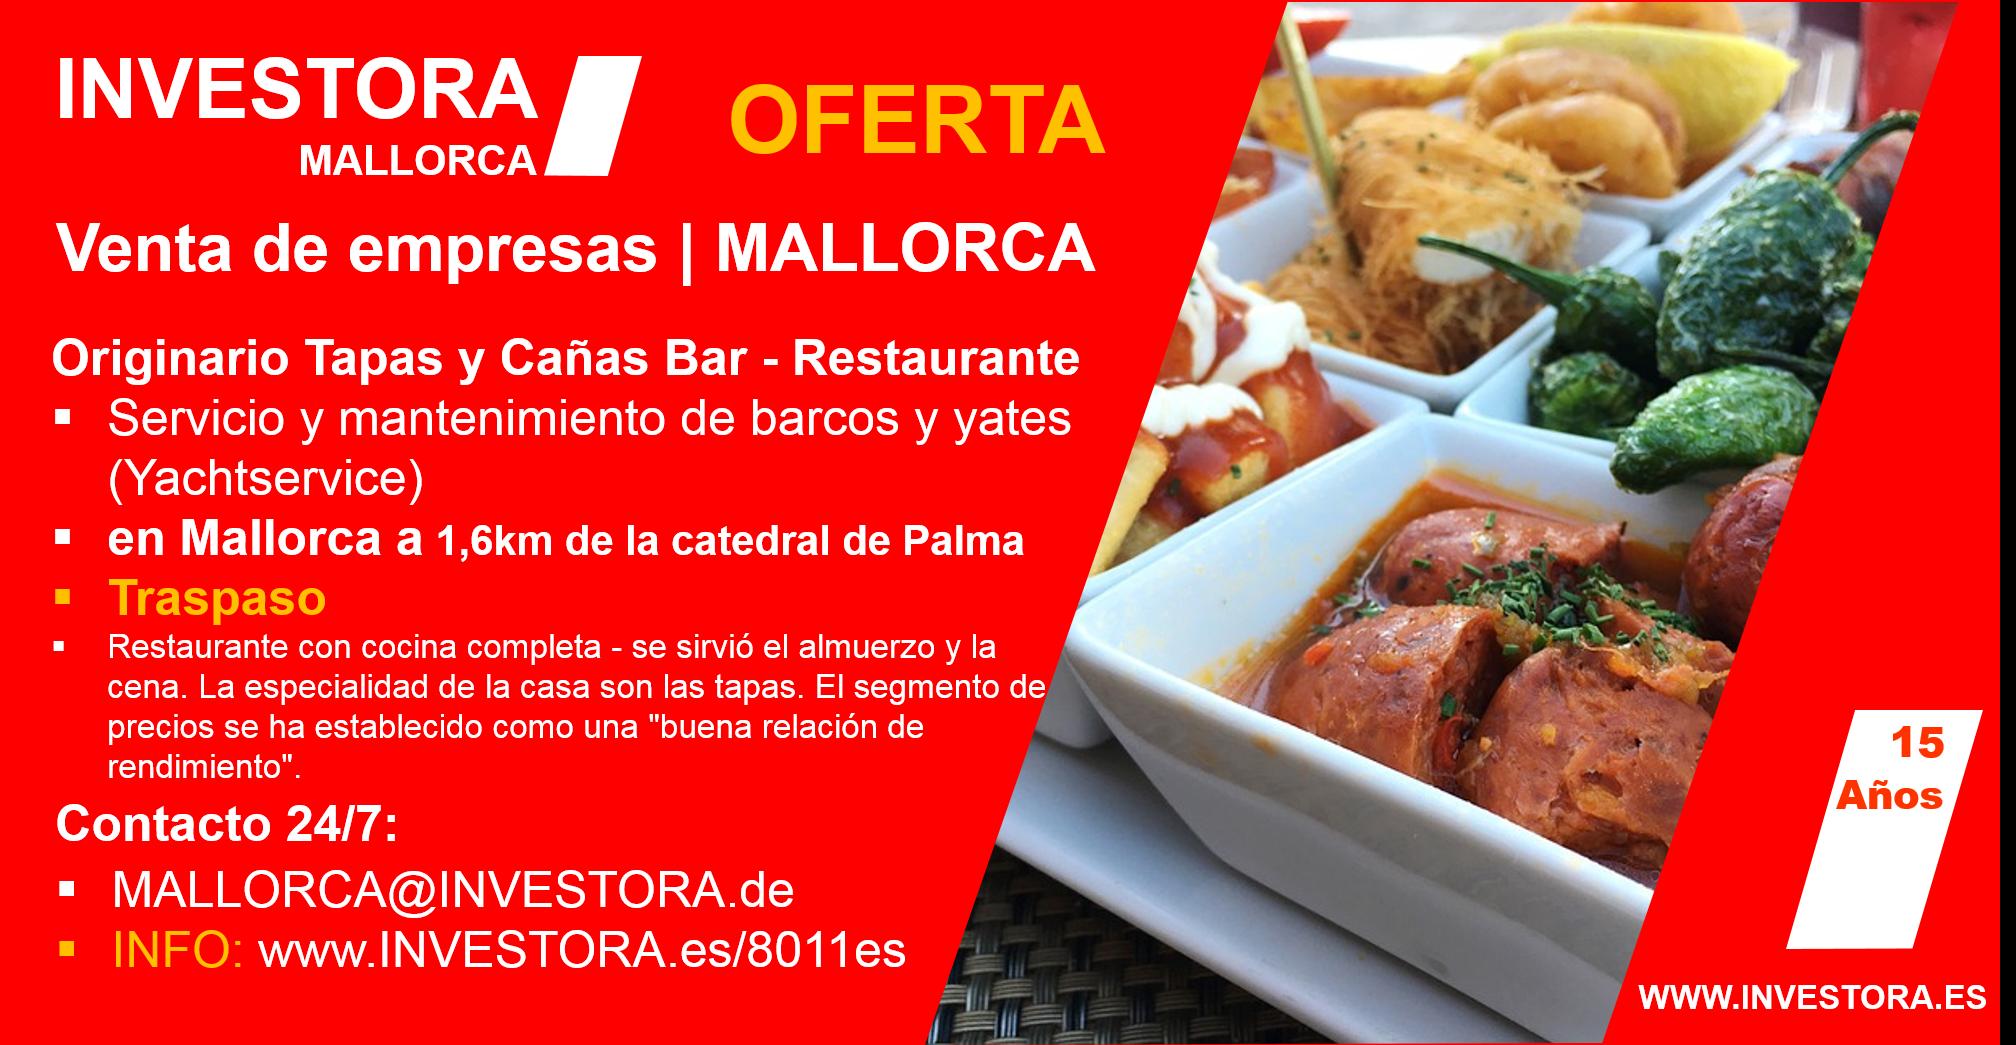 INVESTORA MALLORCA Tapas Bar Restaurante Traspaso